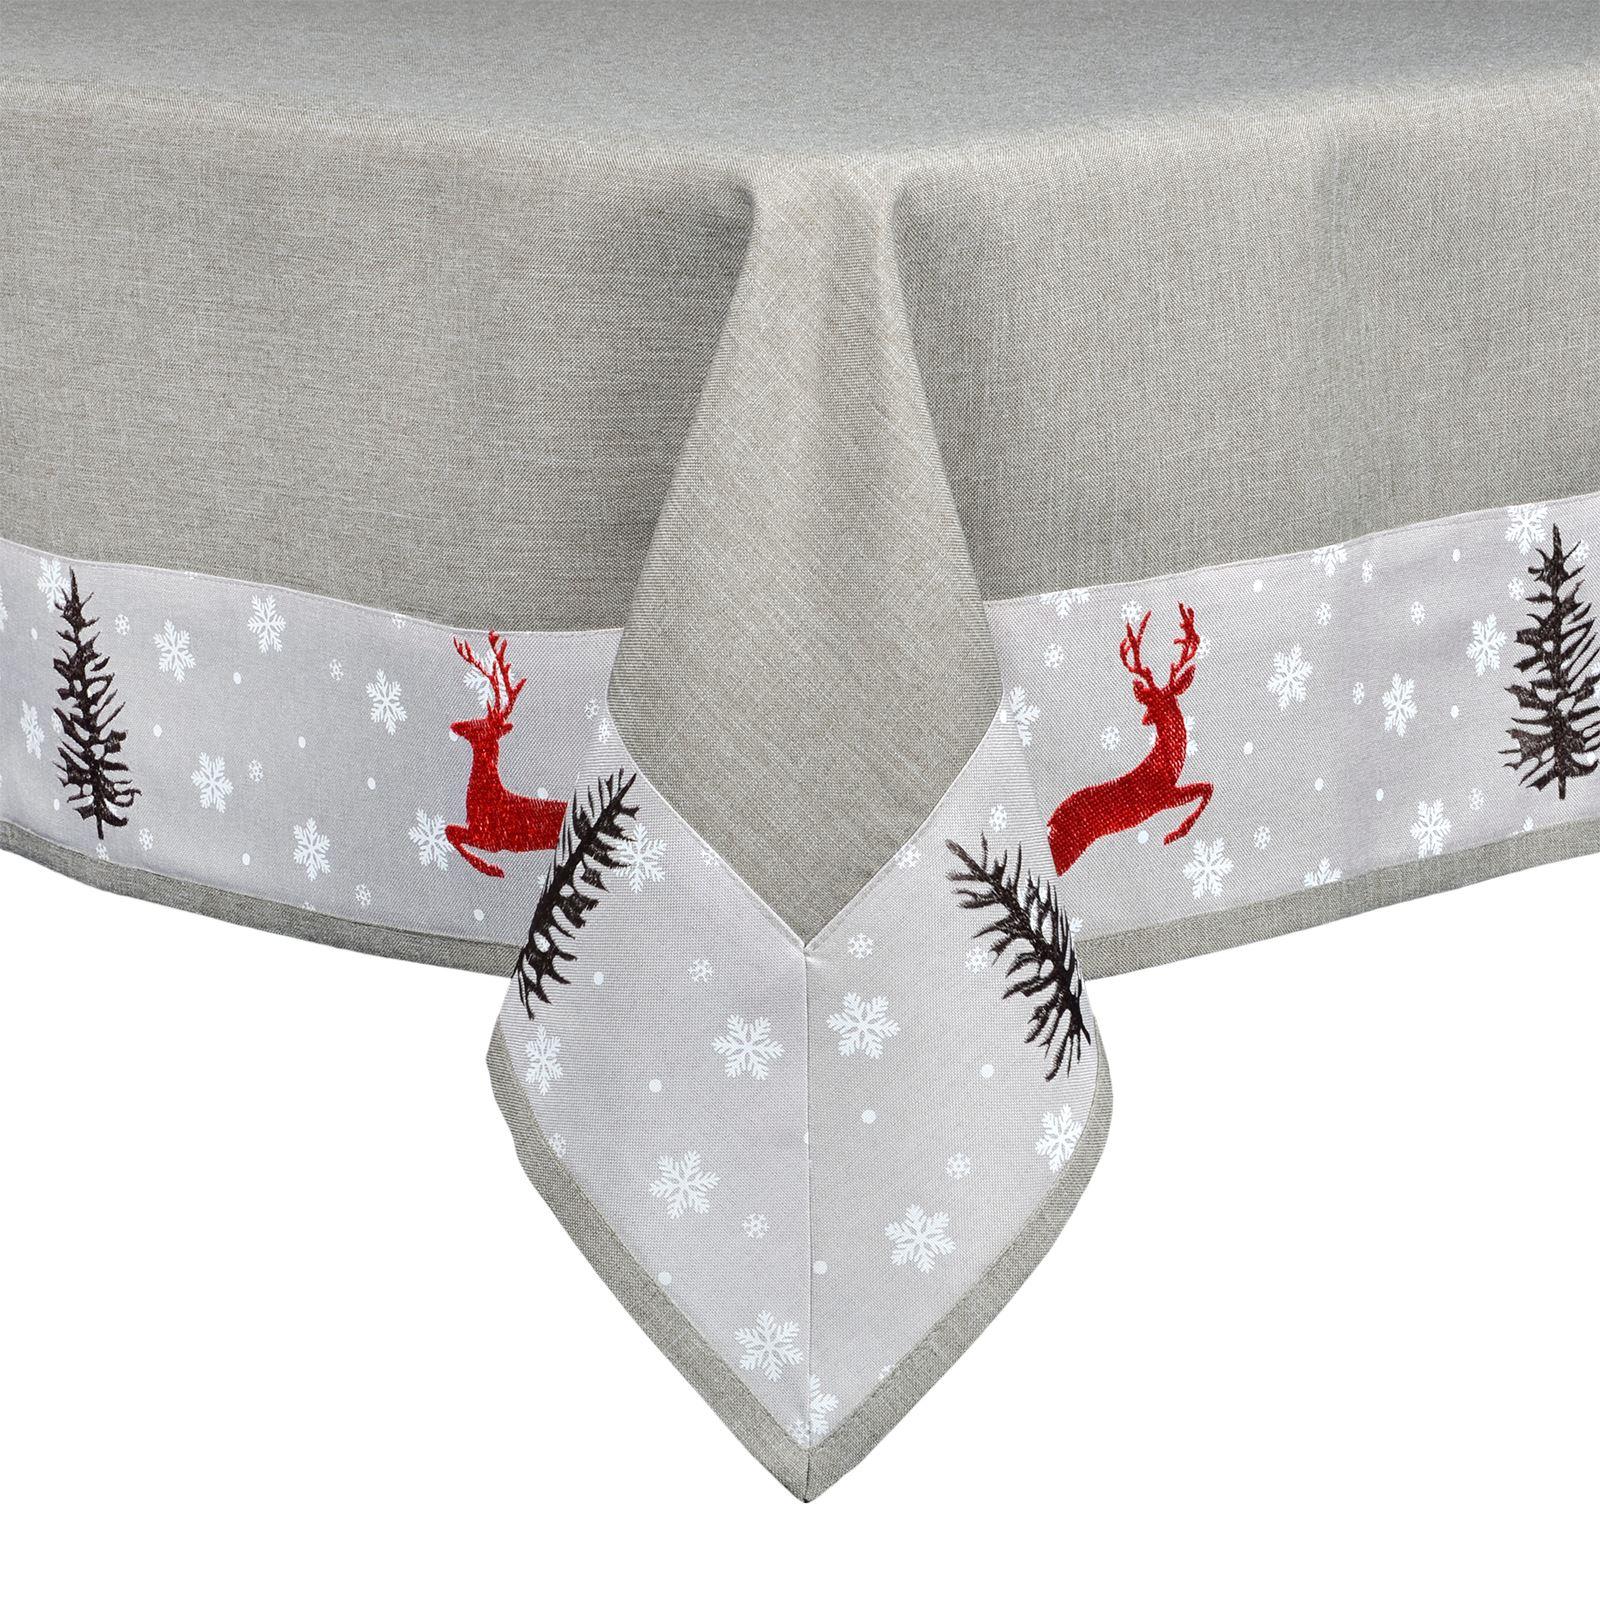 Christmas-Tablecloth-Festive-Pattern-Rectangle-Round-Fabric-Xmas-Room-Decoration Indexbild 43